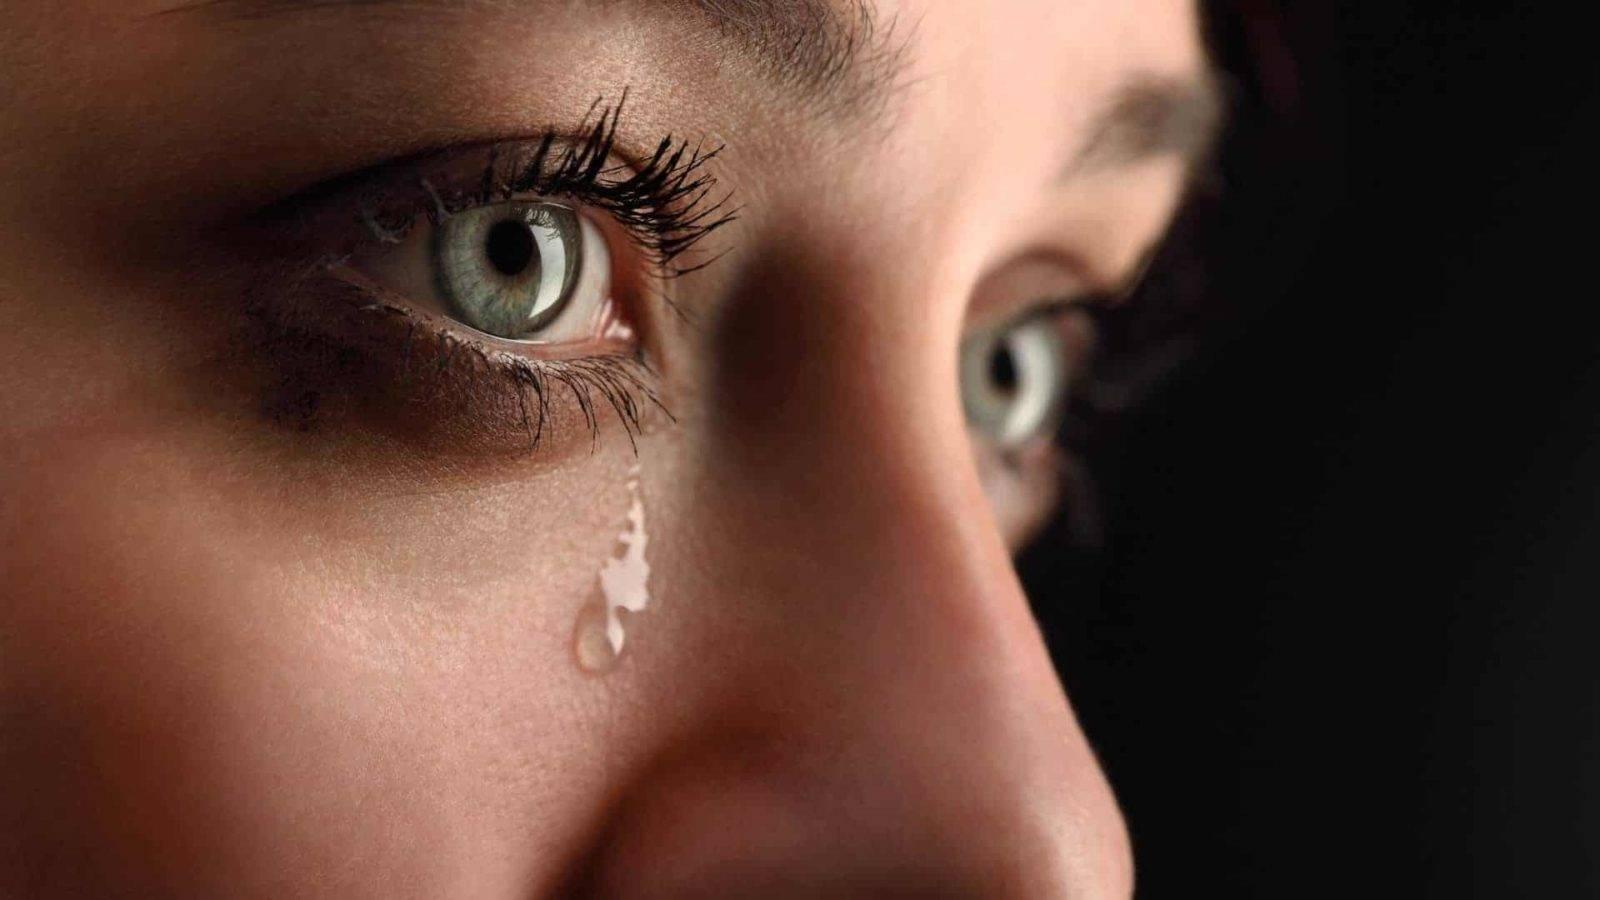 У ребенка нет слез при плаче - вопрос офтальмологу - 03 онлайн